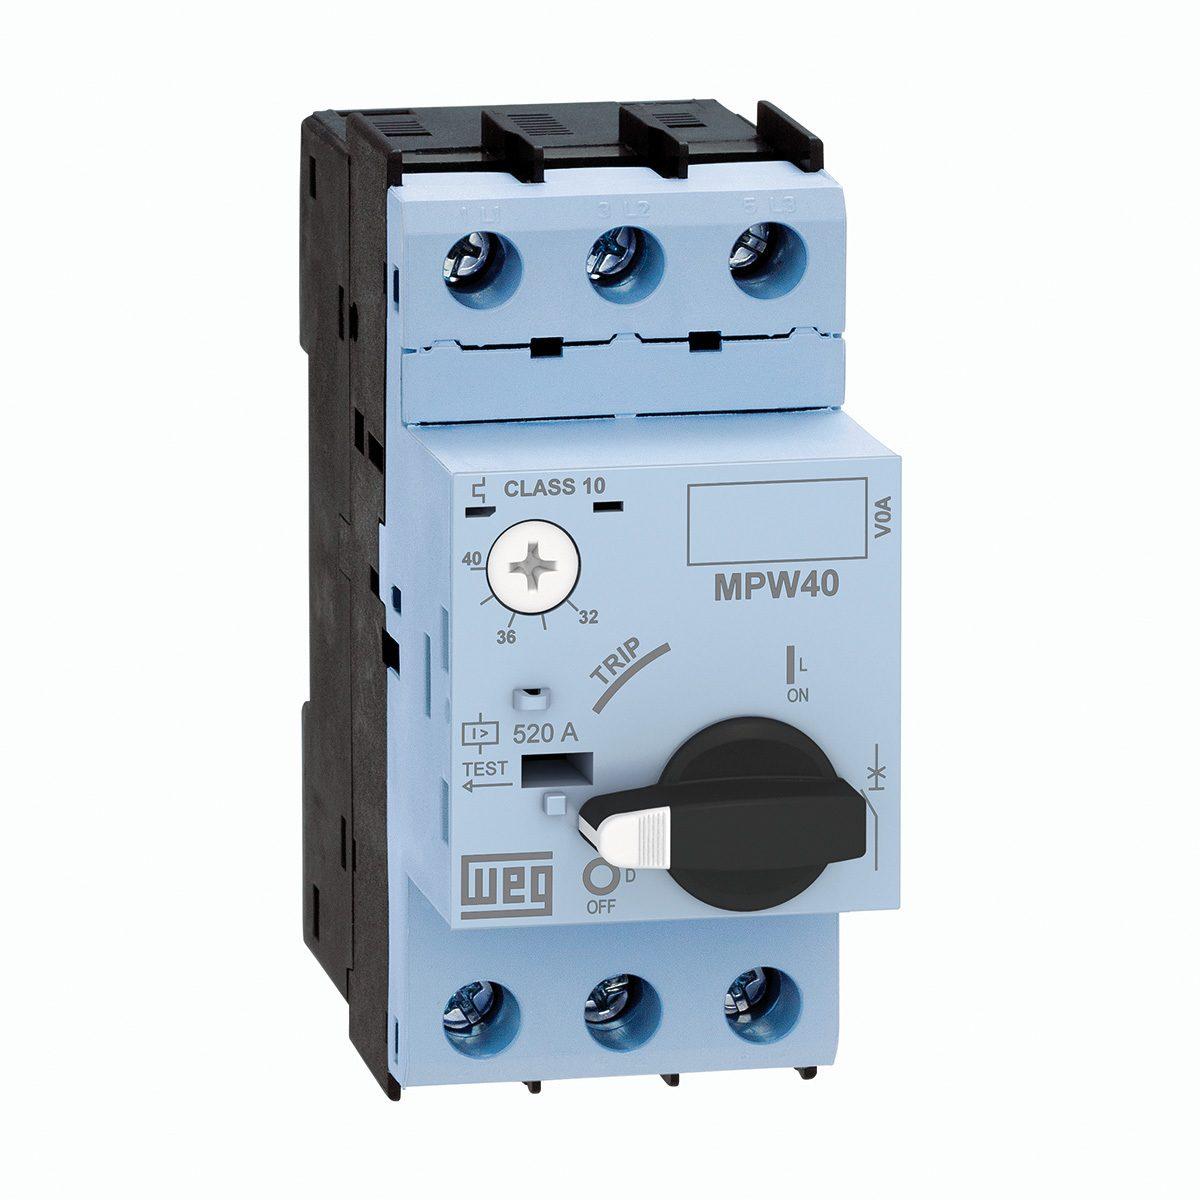 Disjuntor Motor Weg Az Mpw40-3-U040 32-40a